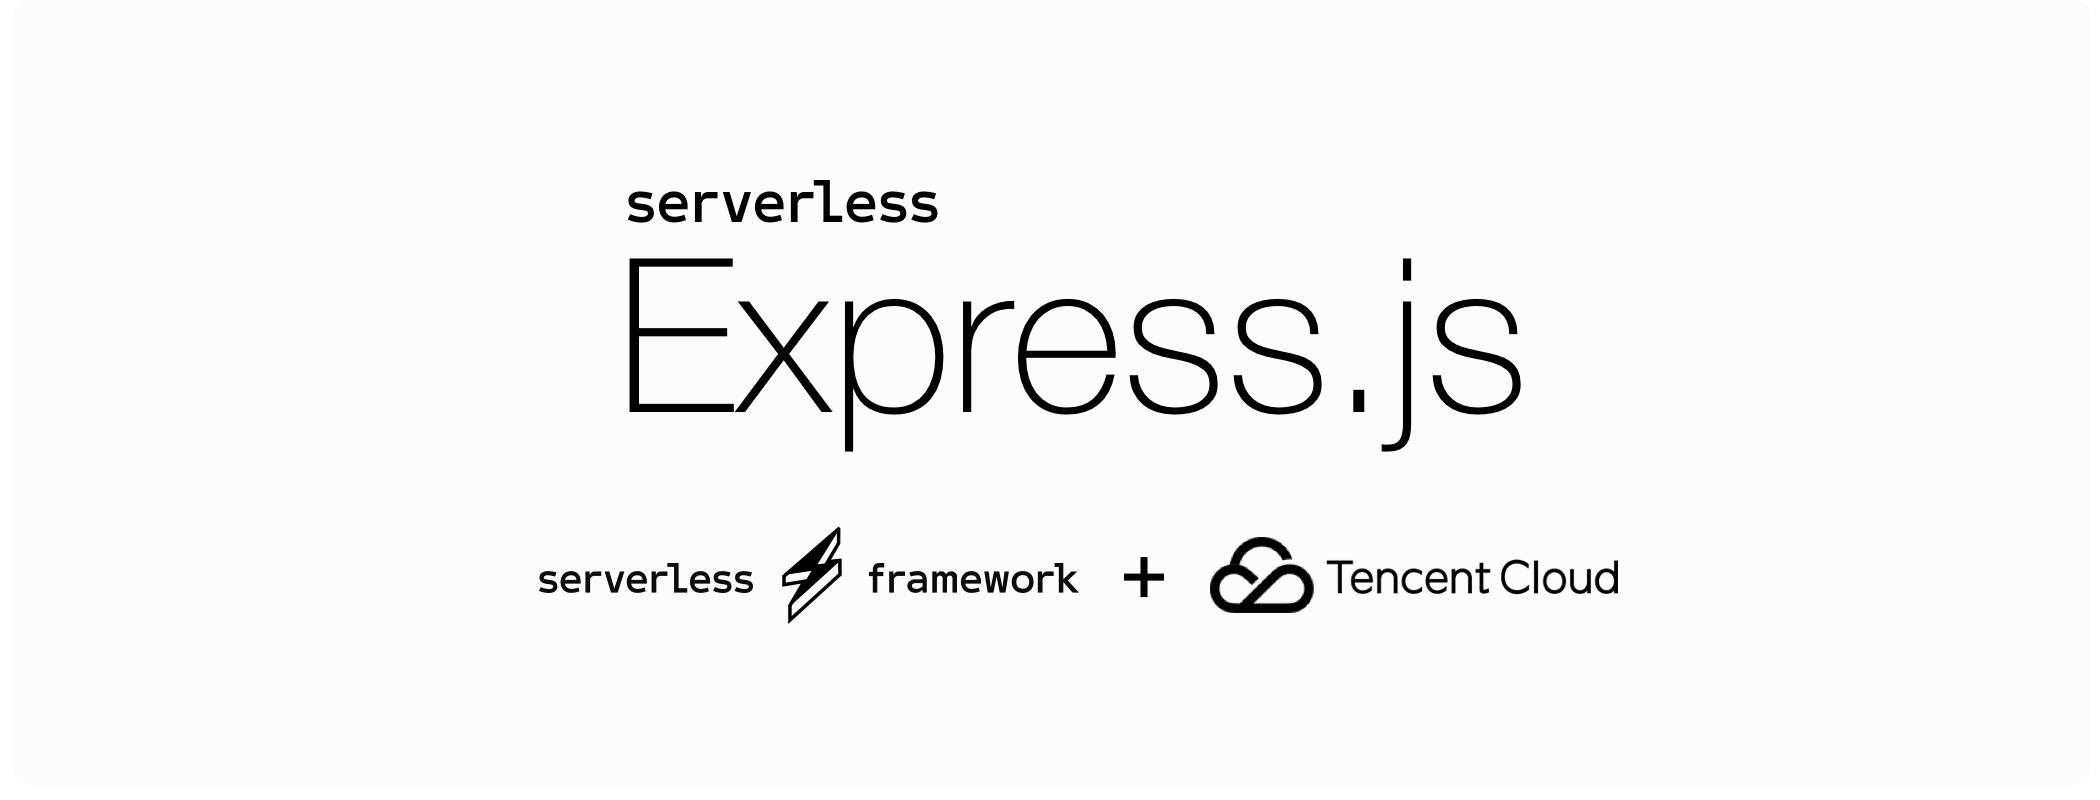 Serverless Express Tencent Cloud